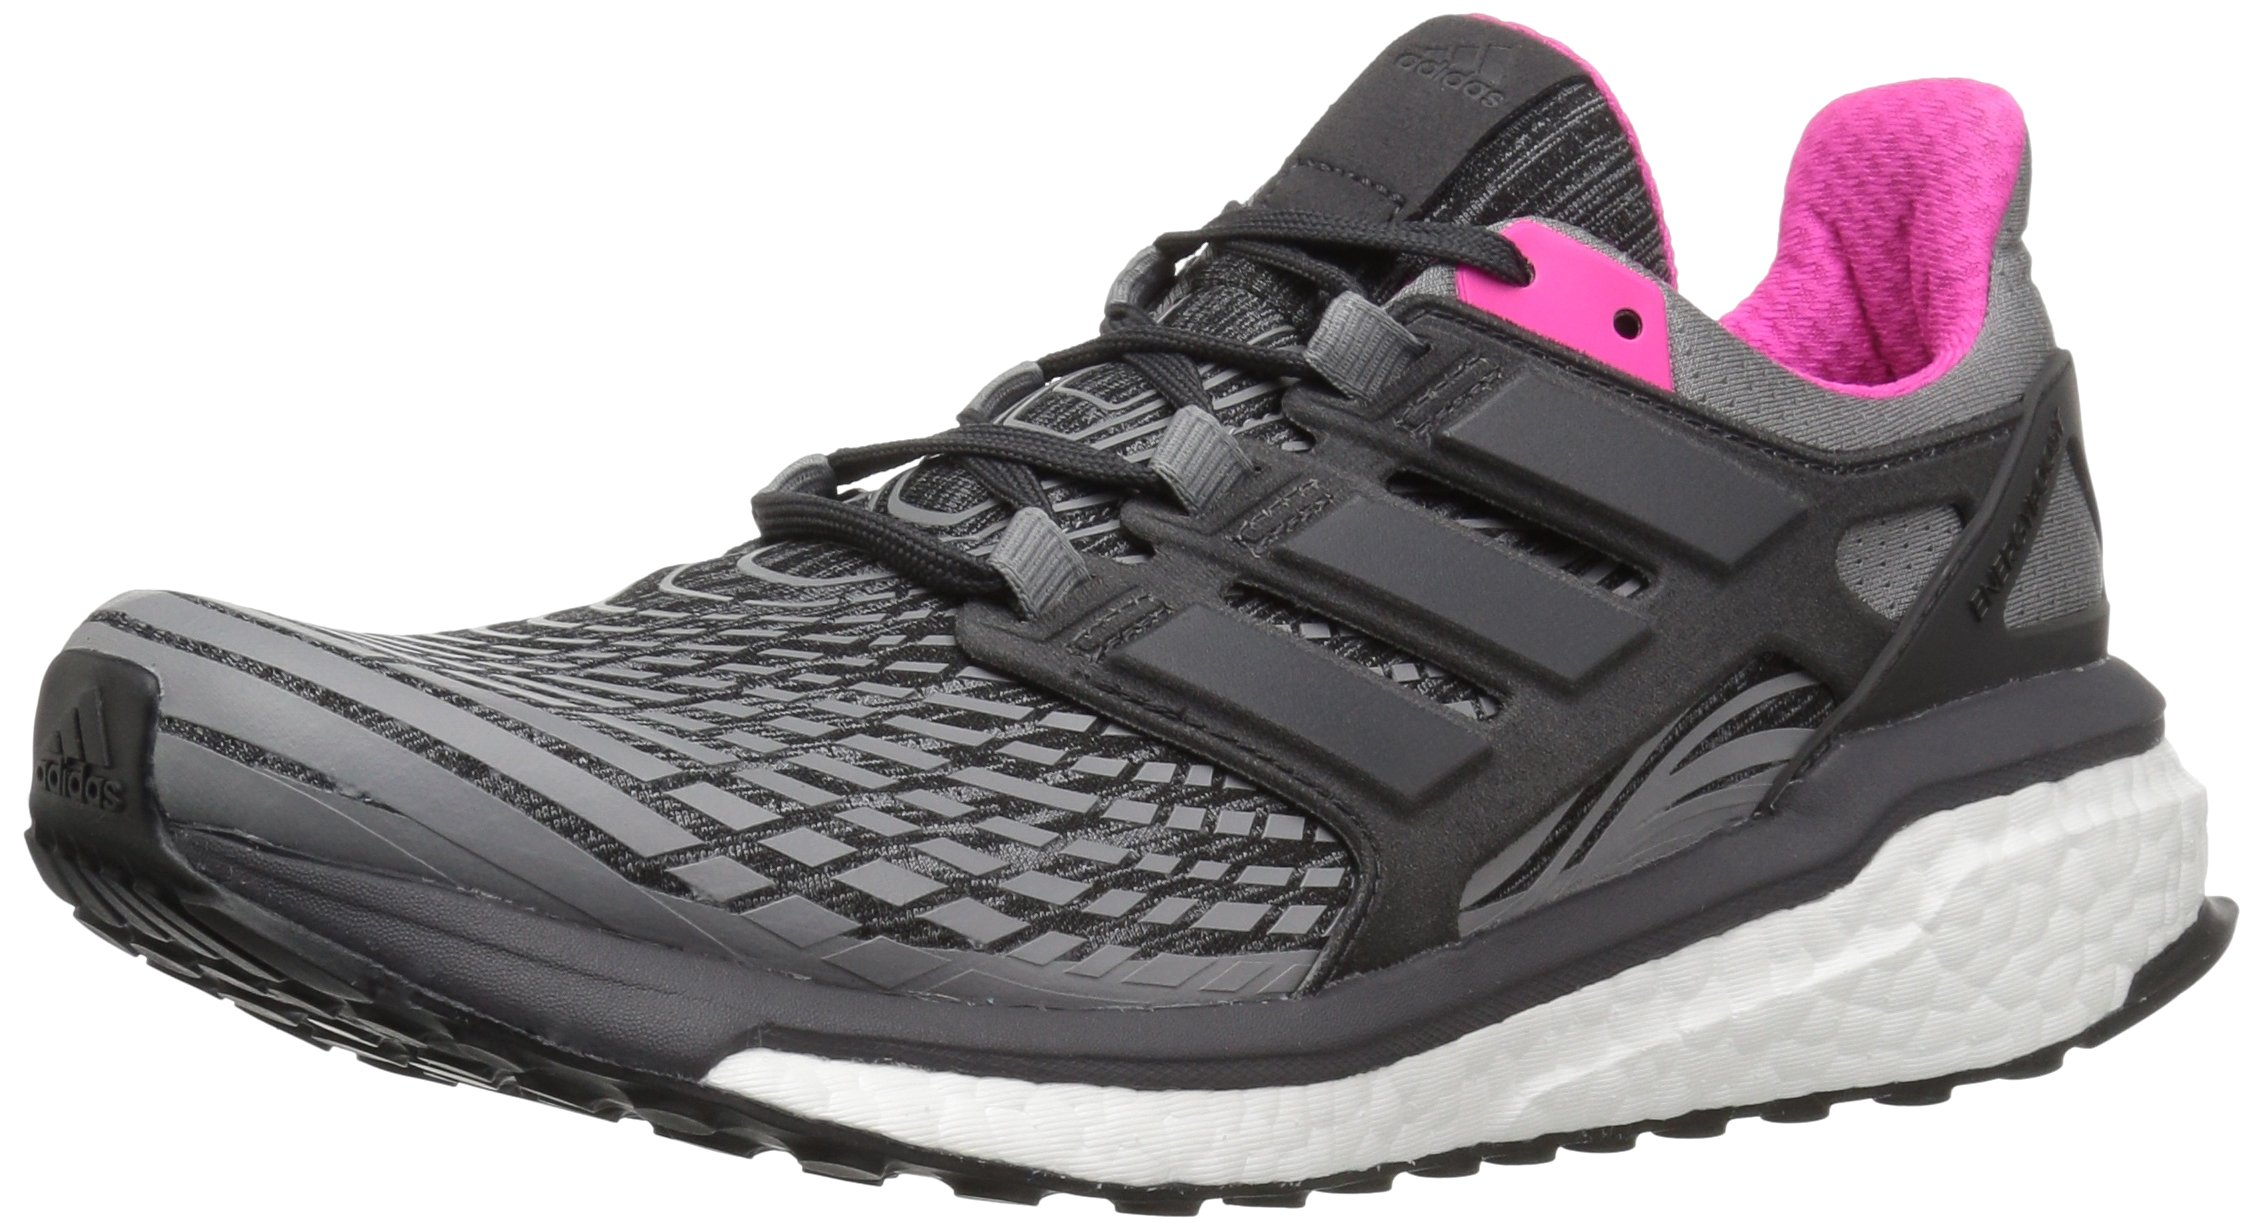 promo code 89f8f 490d5 Galleon - Adidas Women s Energy Boost W Running Shoe, Three Utility Black Grey  Four, 7.5 Medium US